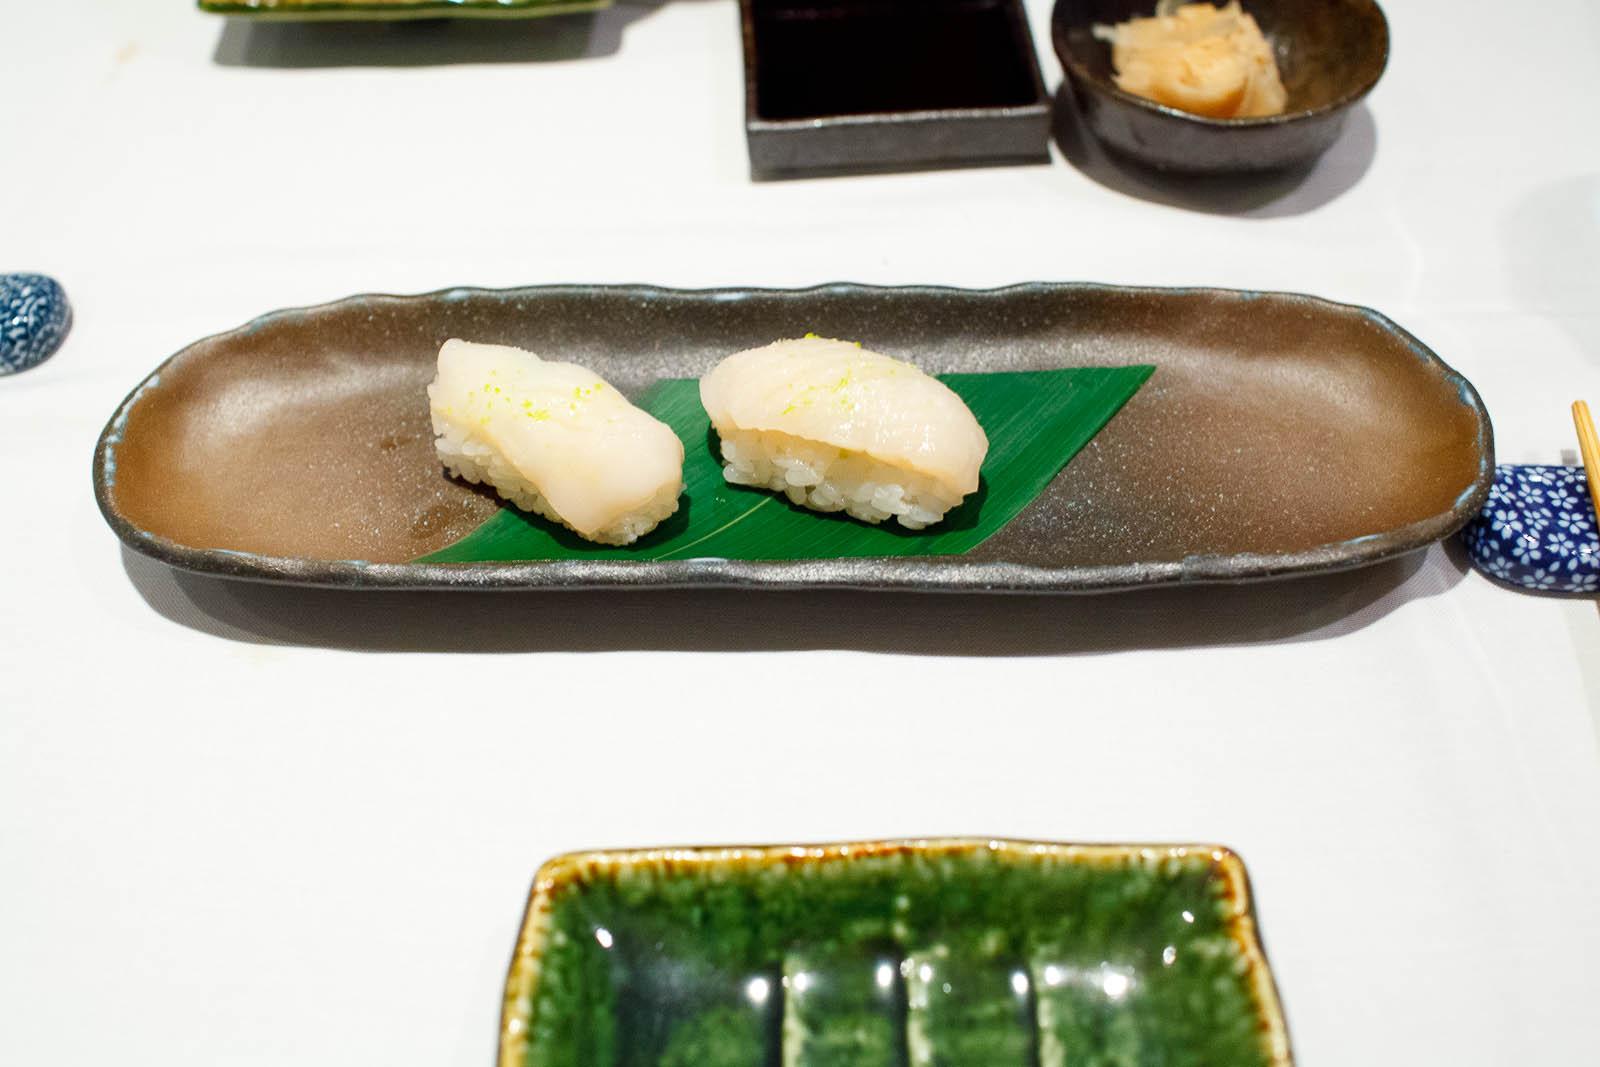 Maine scallop sushi ($5)